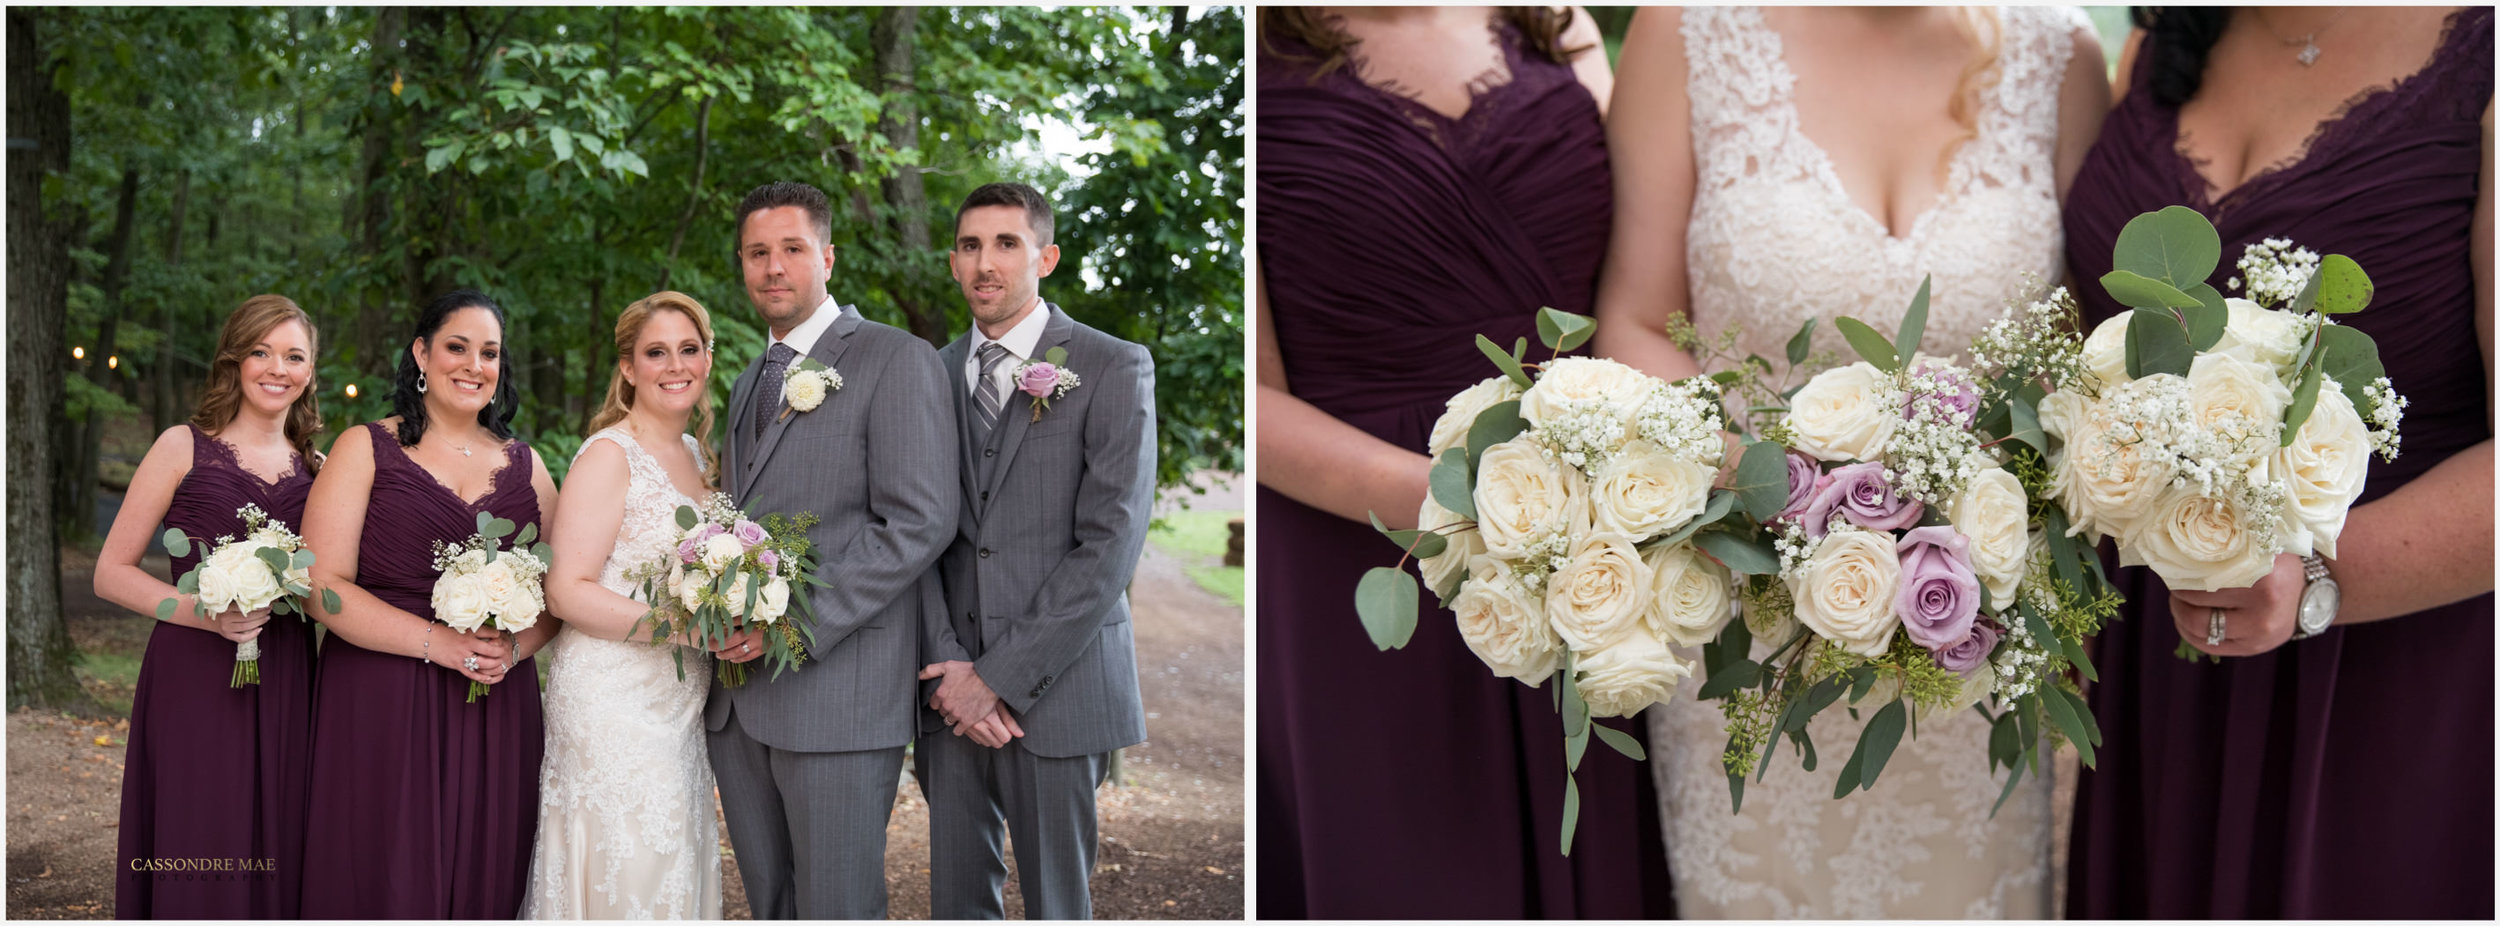 Cassondre Mae Photography Emmerich Tree Farm Wedding 20.jpg